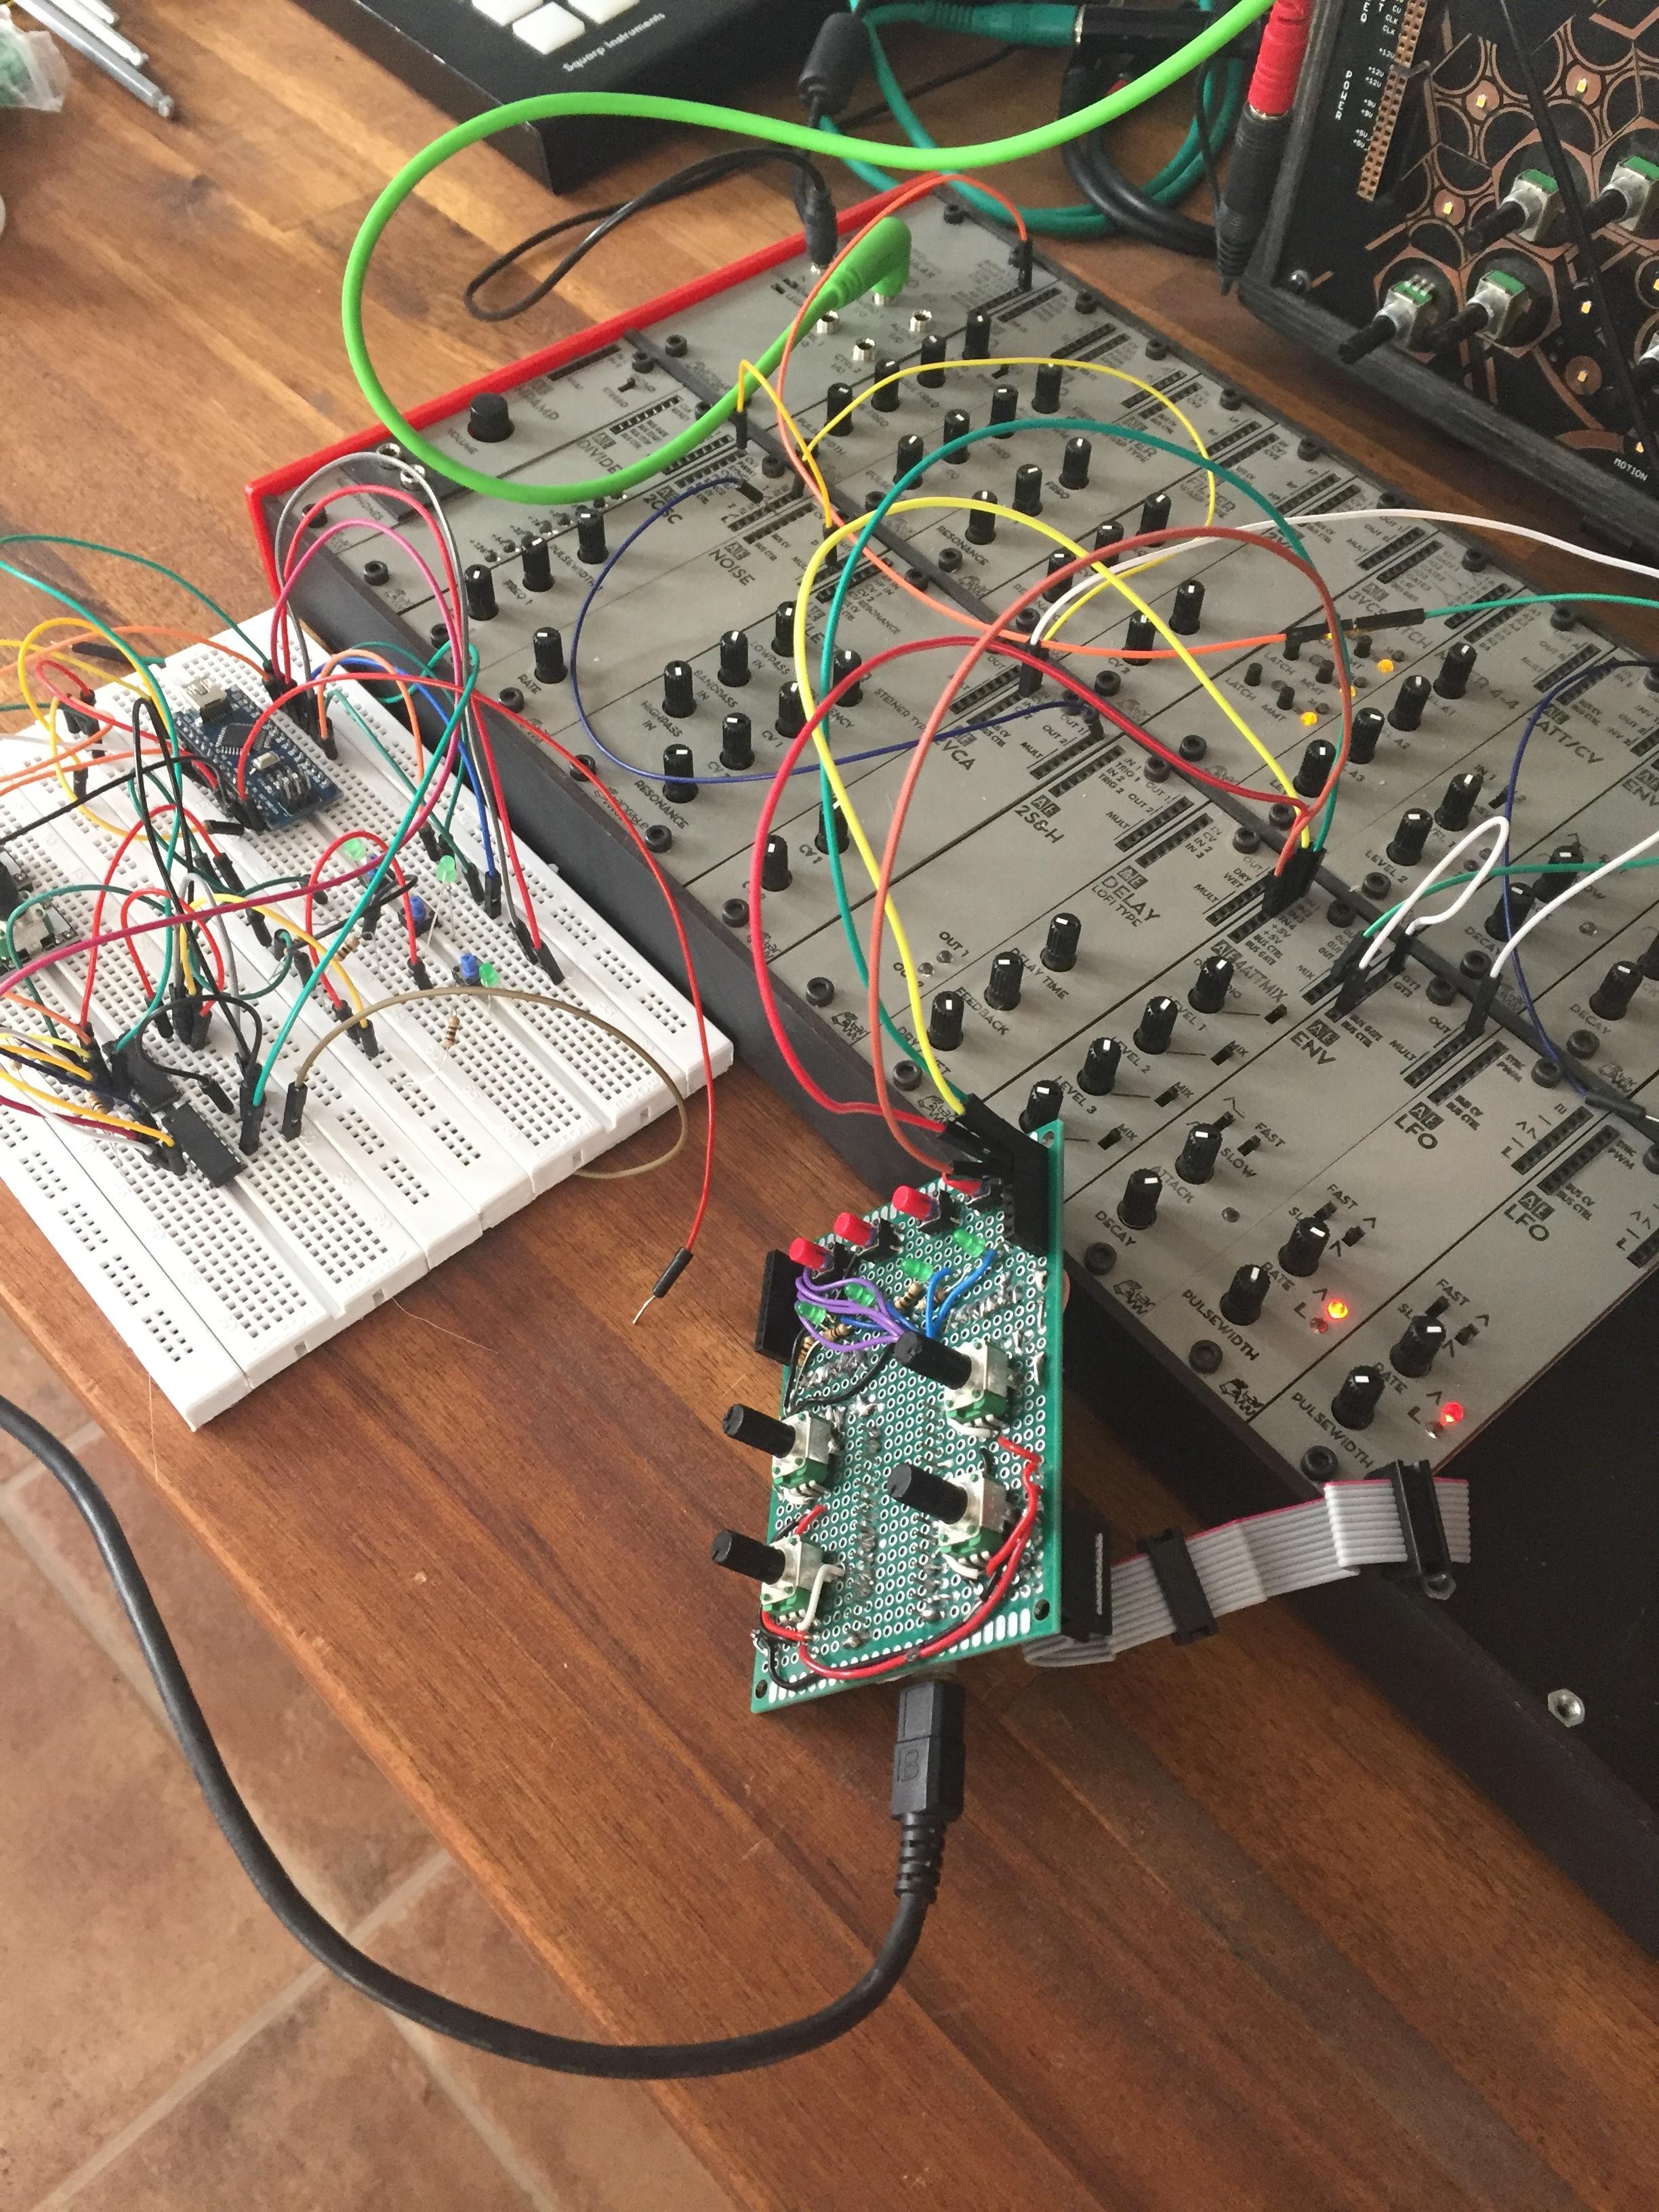 AE Modular: budget analog modular synth - Equipment - lines